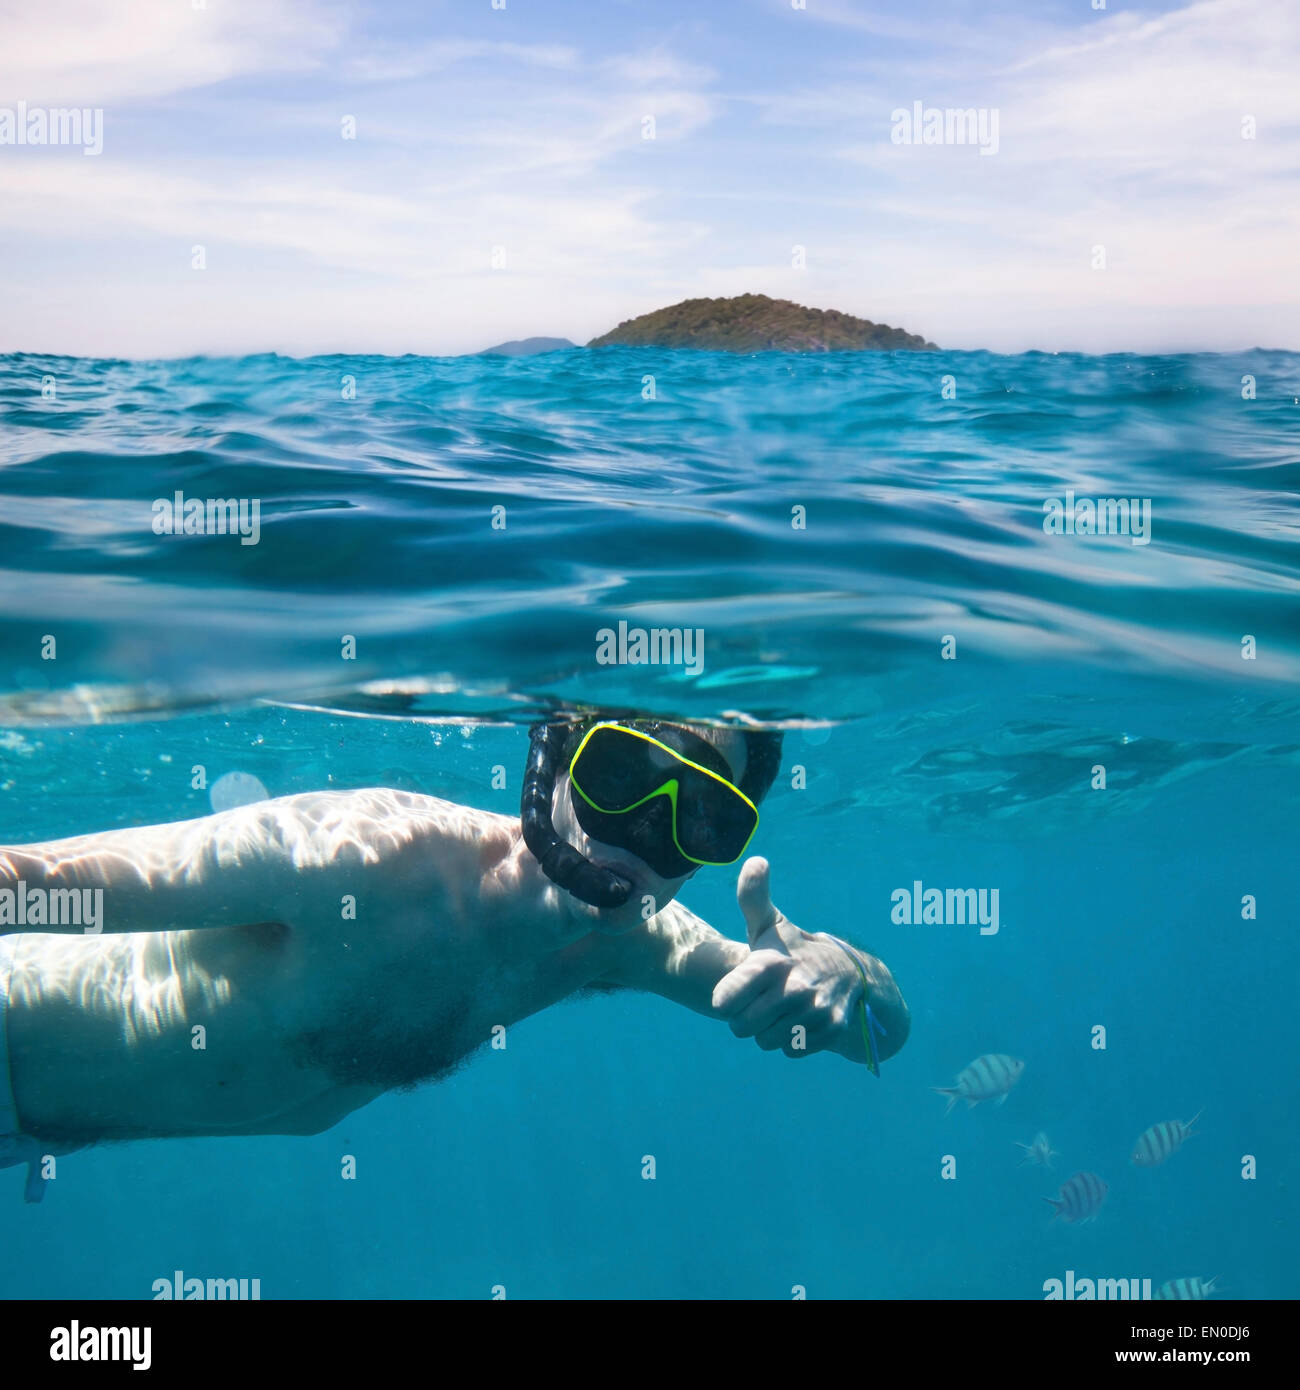 young man snorkeling, underwater split photo - Stock Image